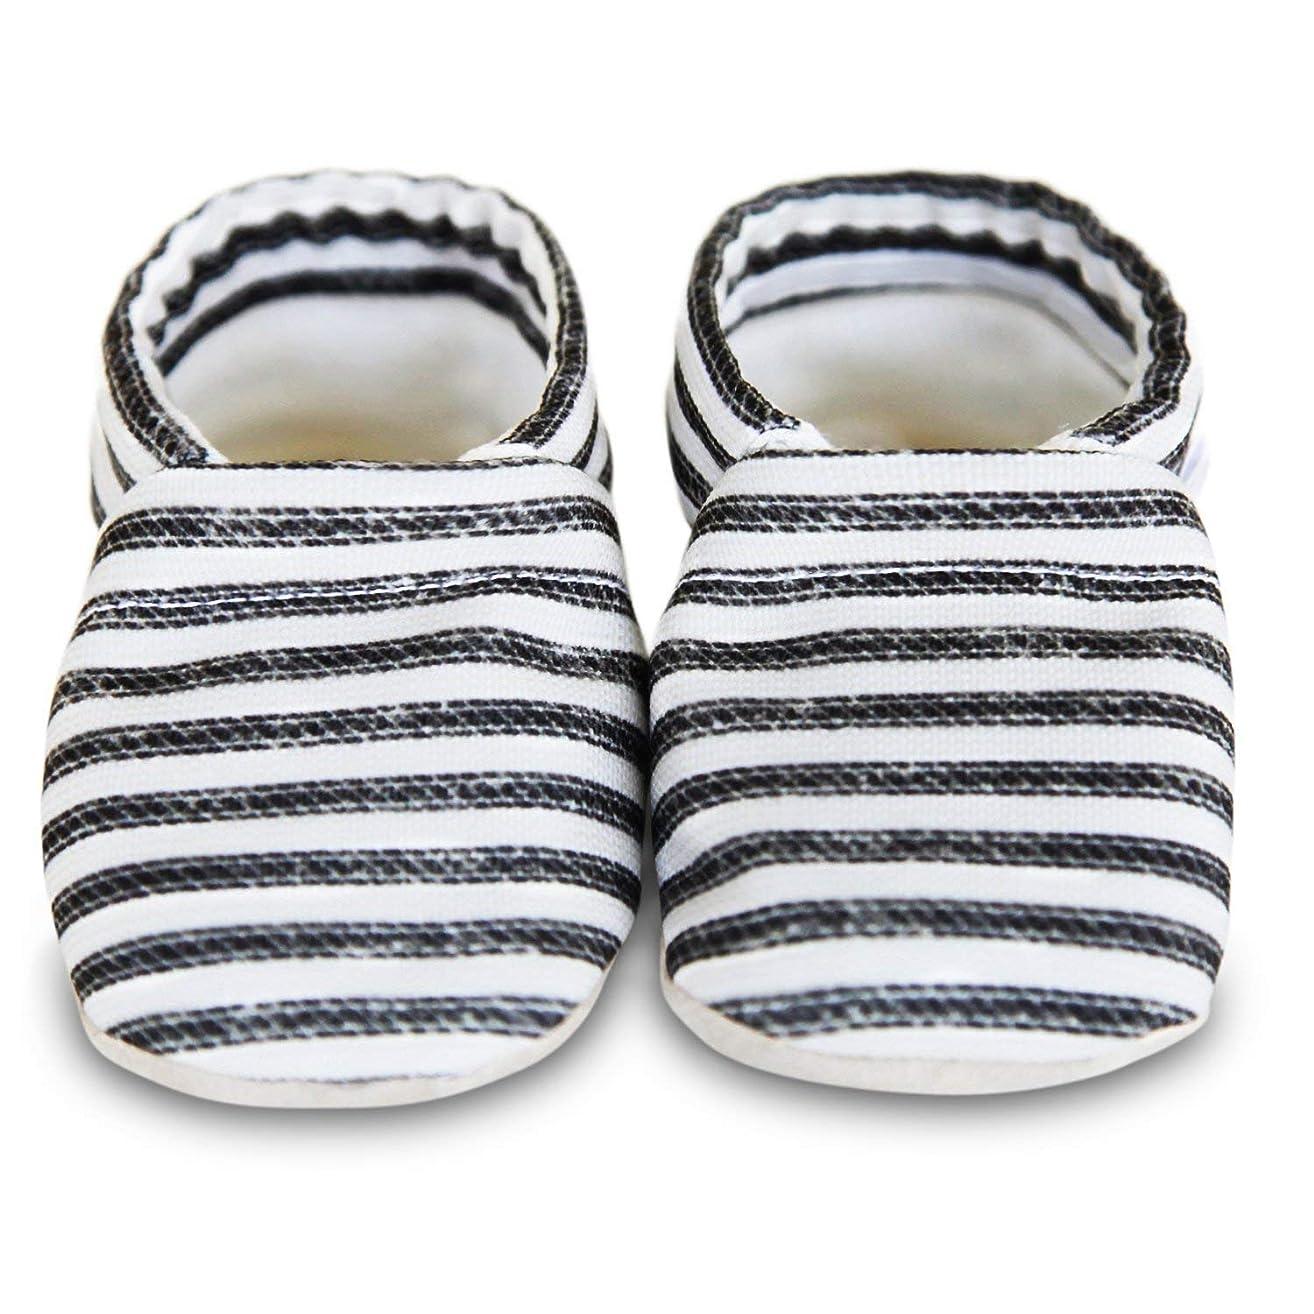 Organic soft soled baby shoes, JORDAN